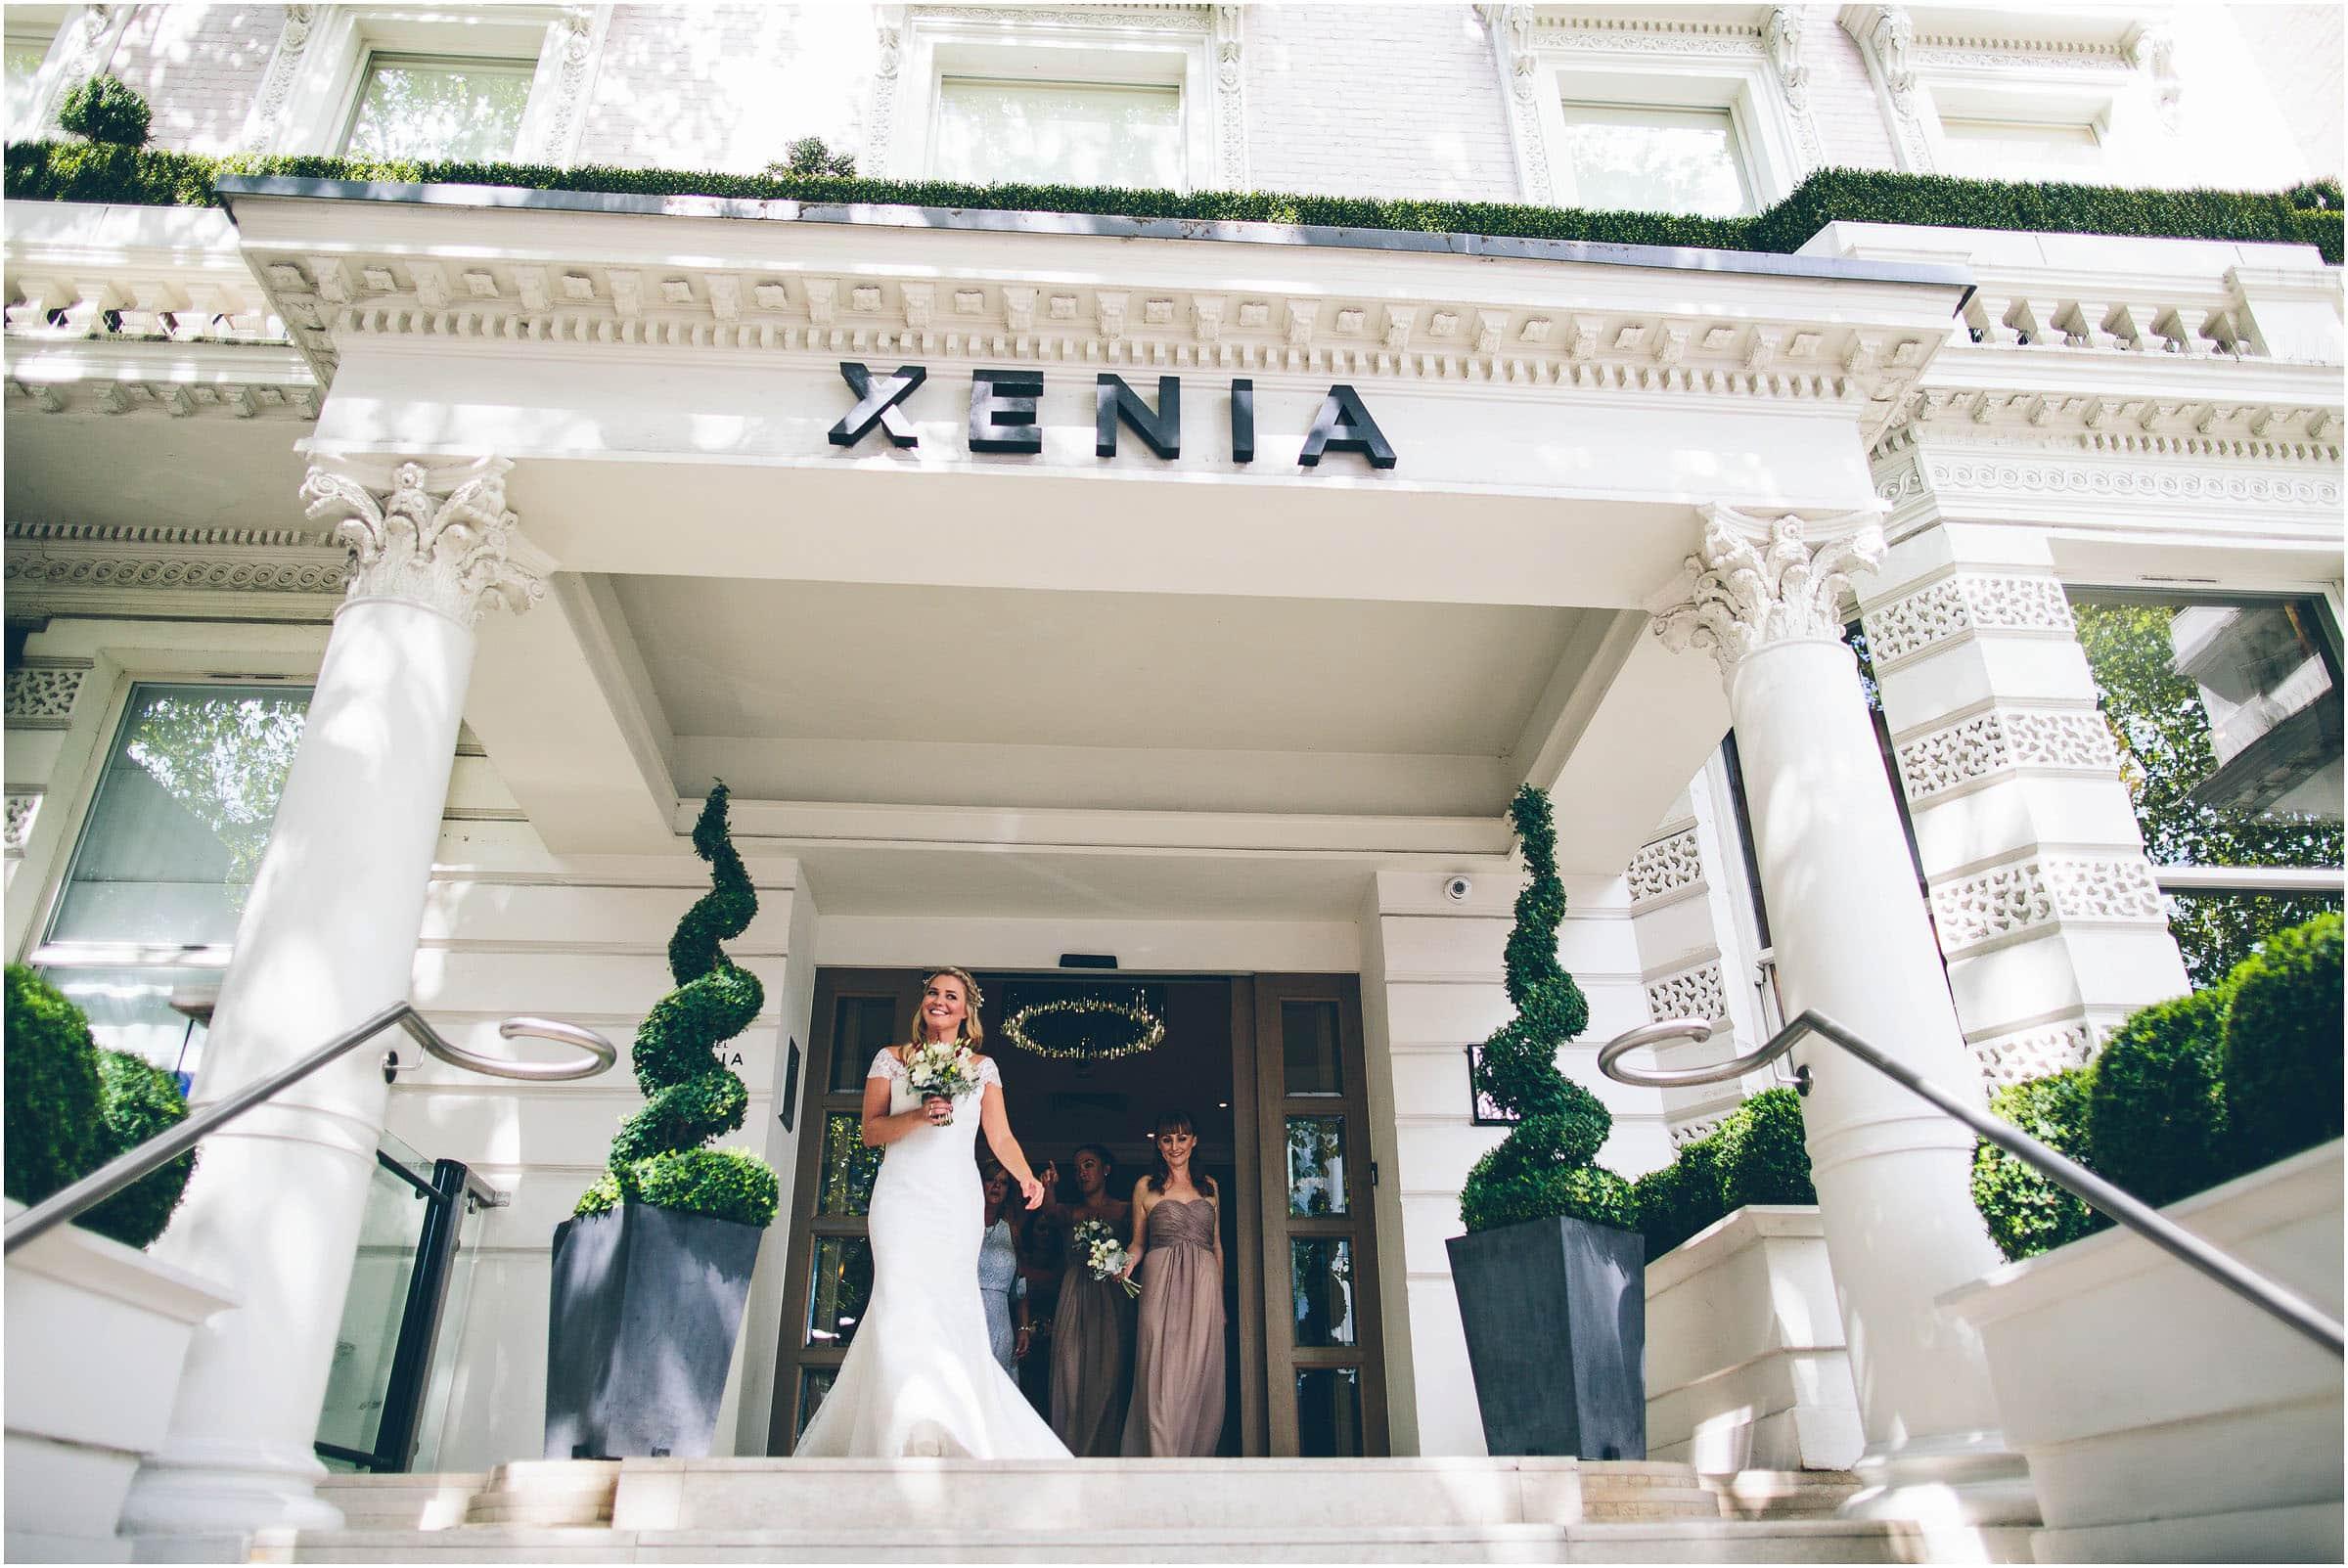 Kensington_Roof_Gardens_Wedding_Photography_0019